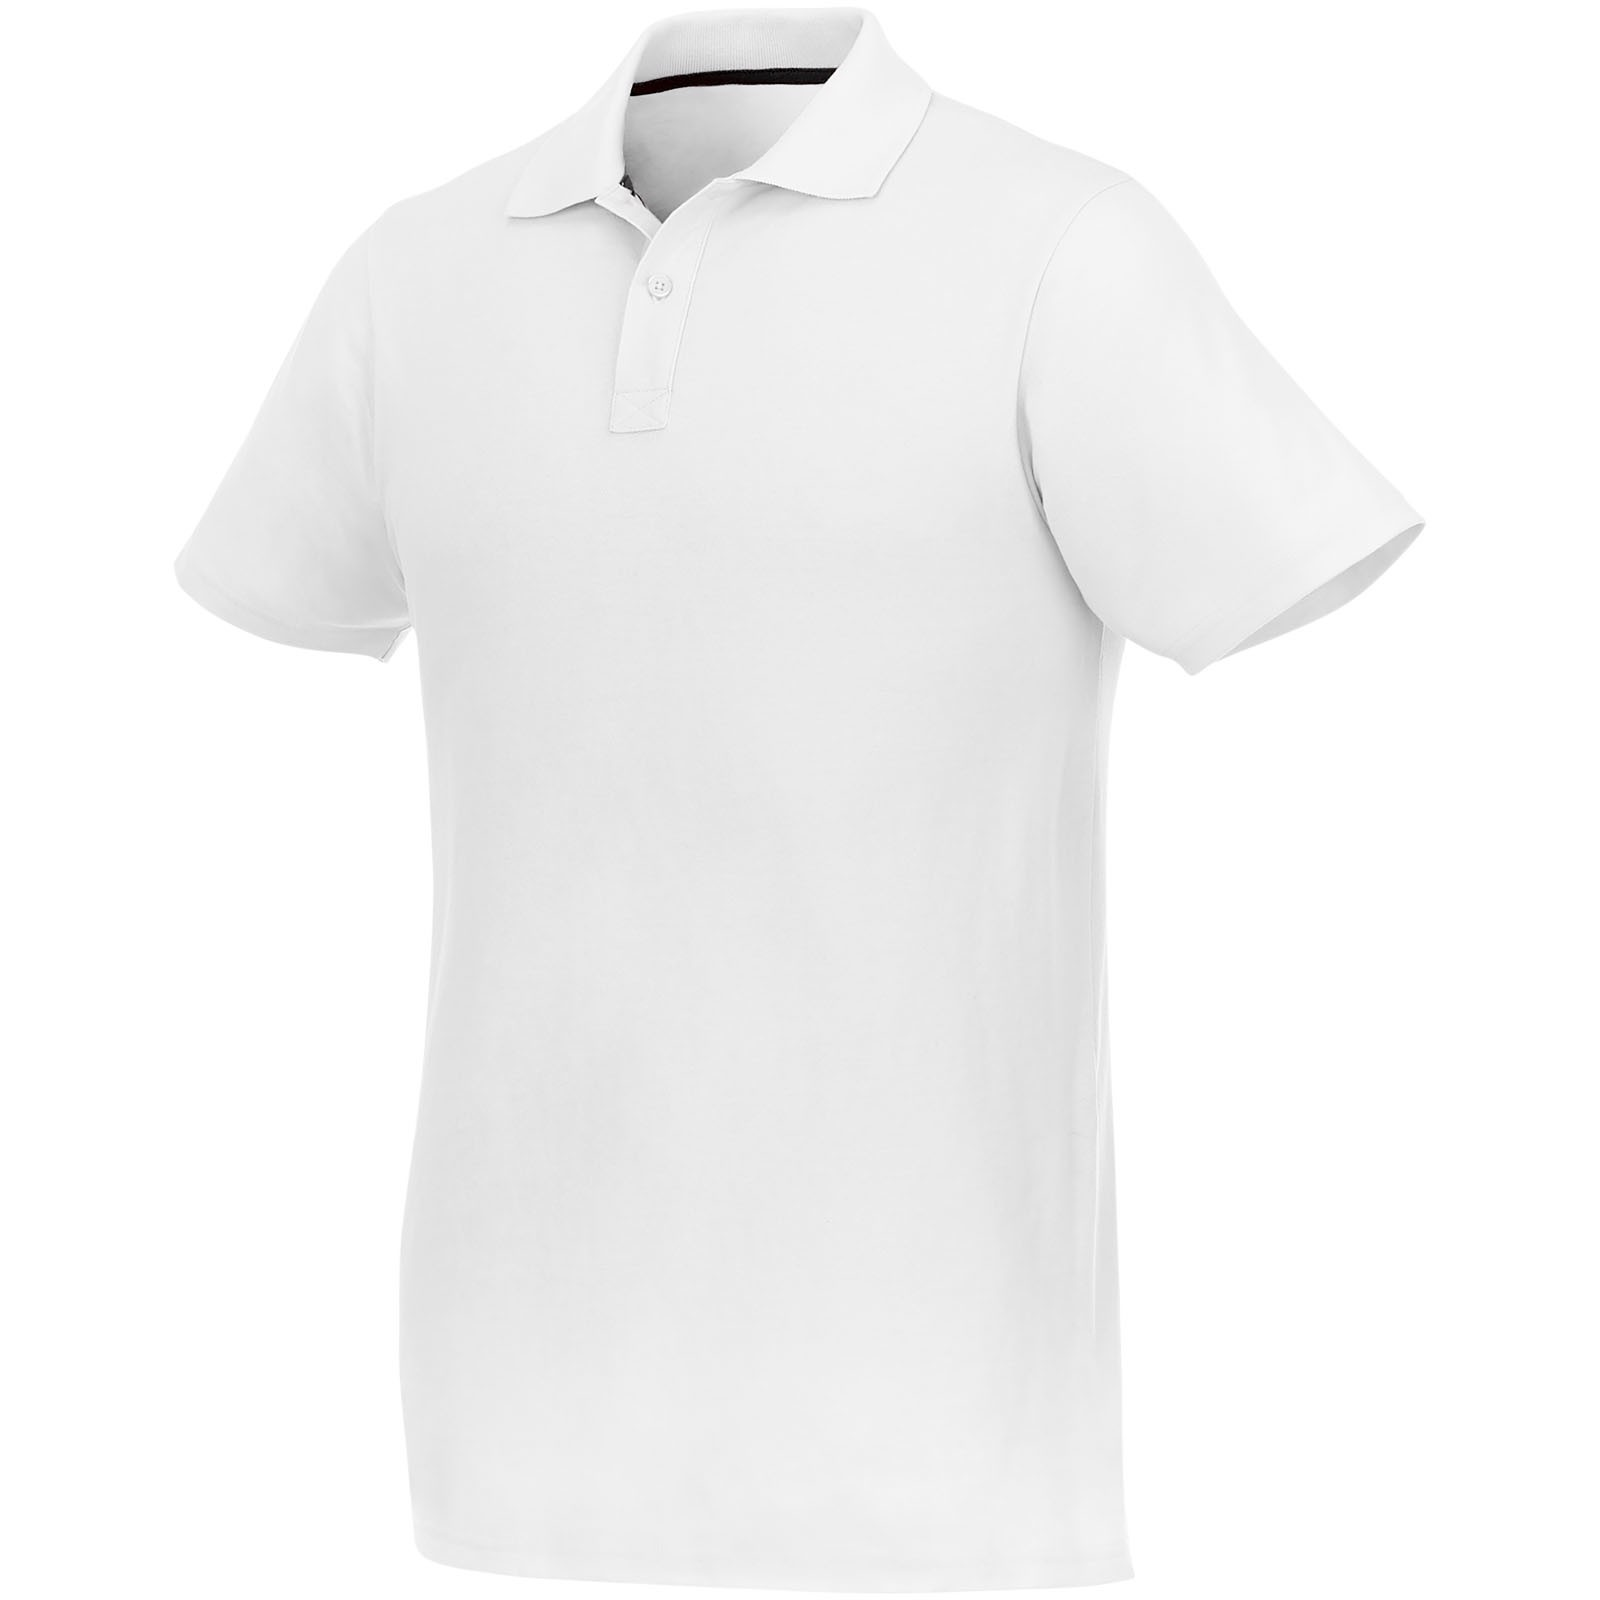 Helios short sleeve men's polo - White / S